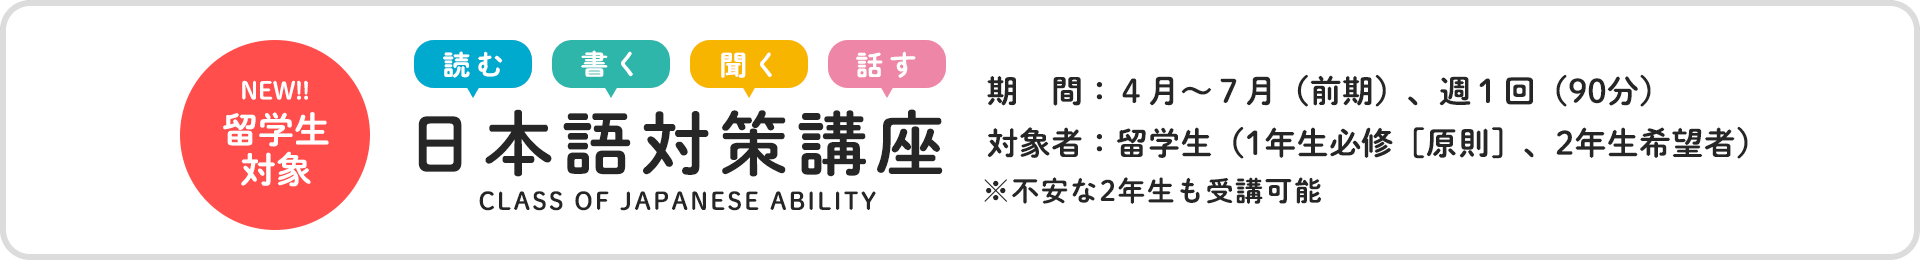 日本語対策講座 | CLASS OF JAPANESE ABILITY